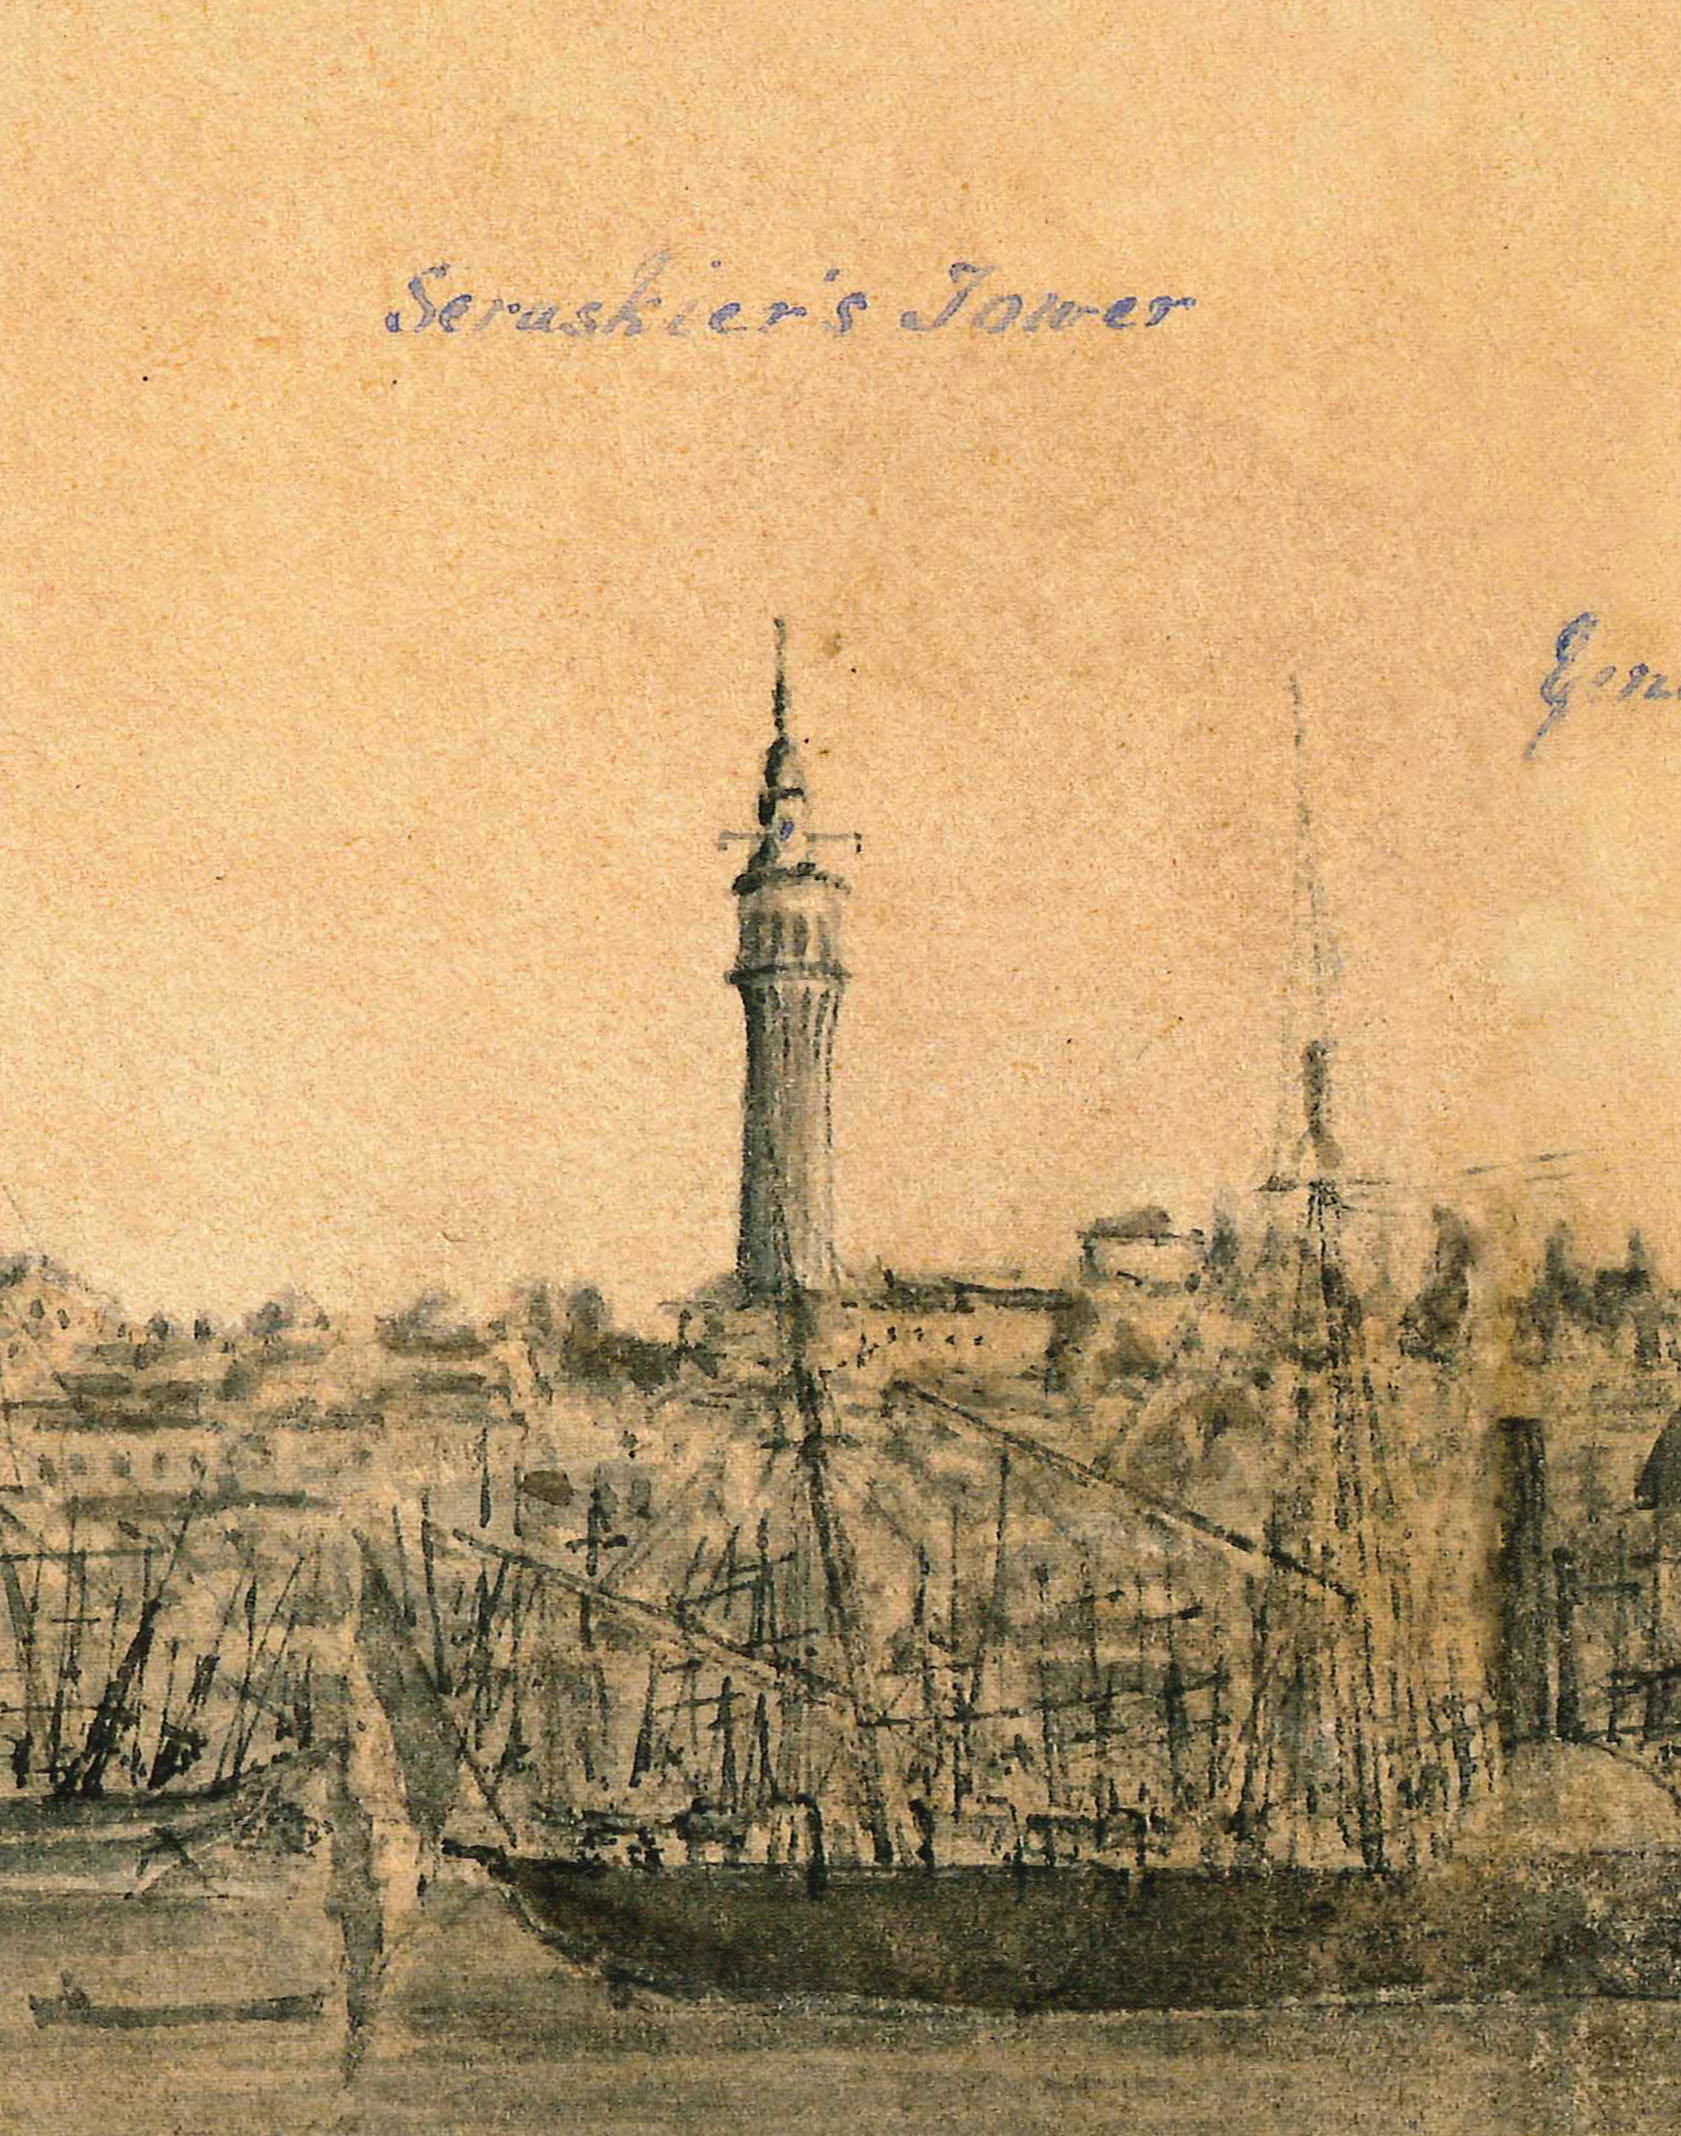 Montagu B. Dunn, Panorama of Istanbul, 1855